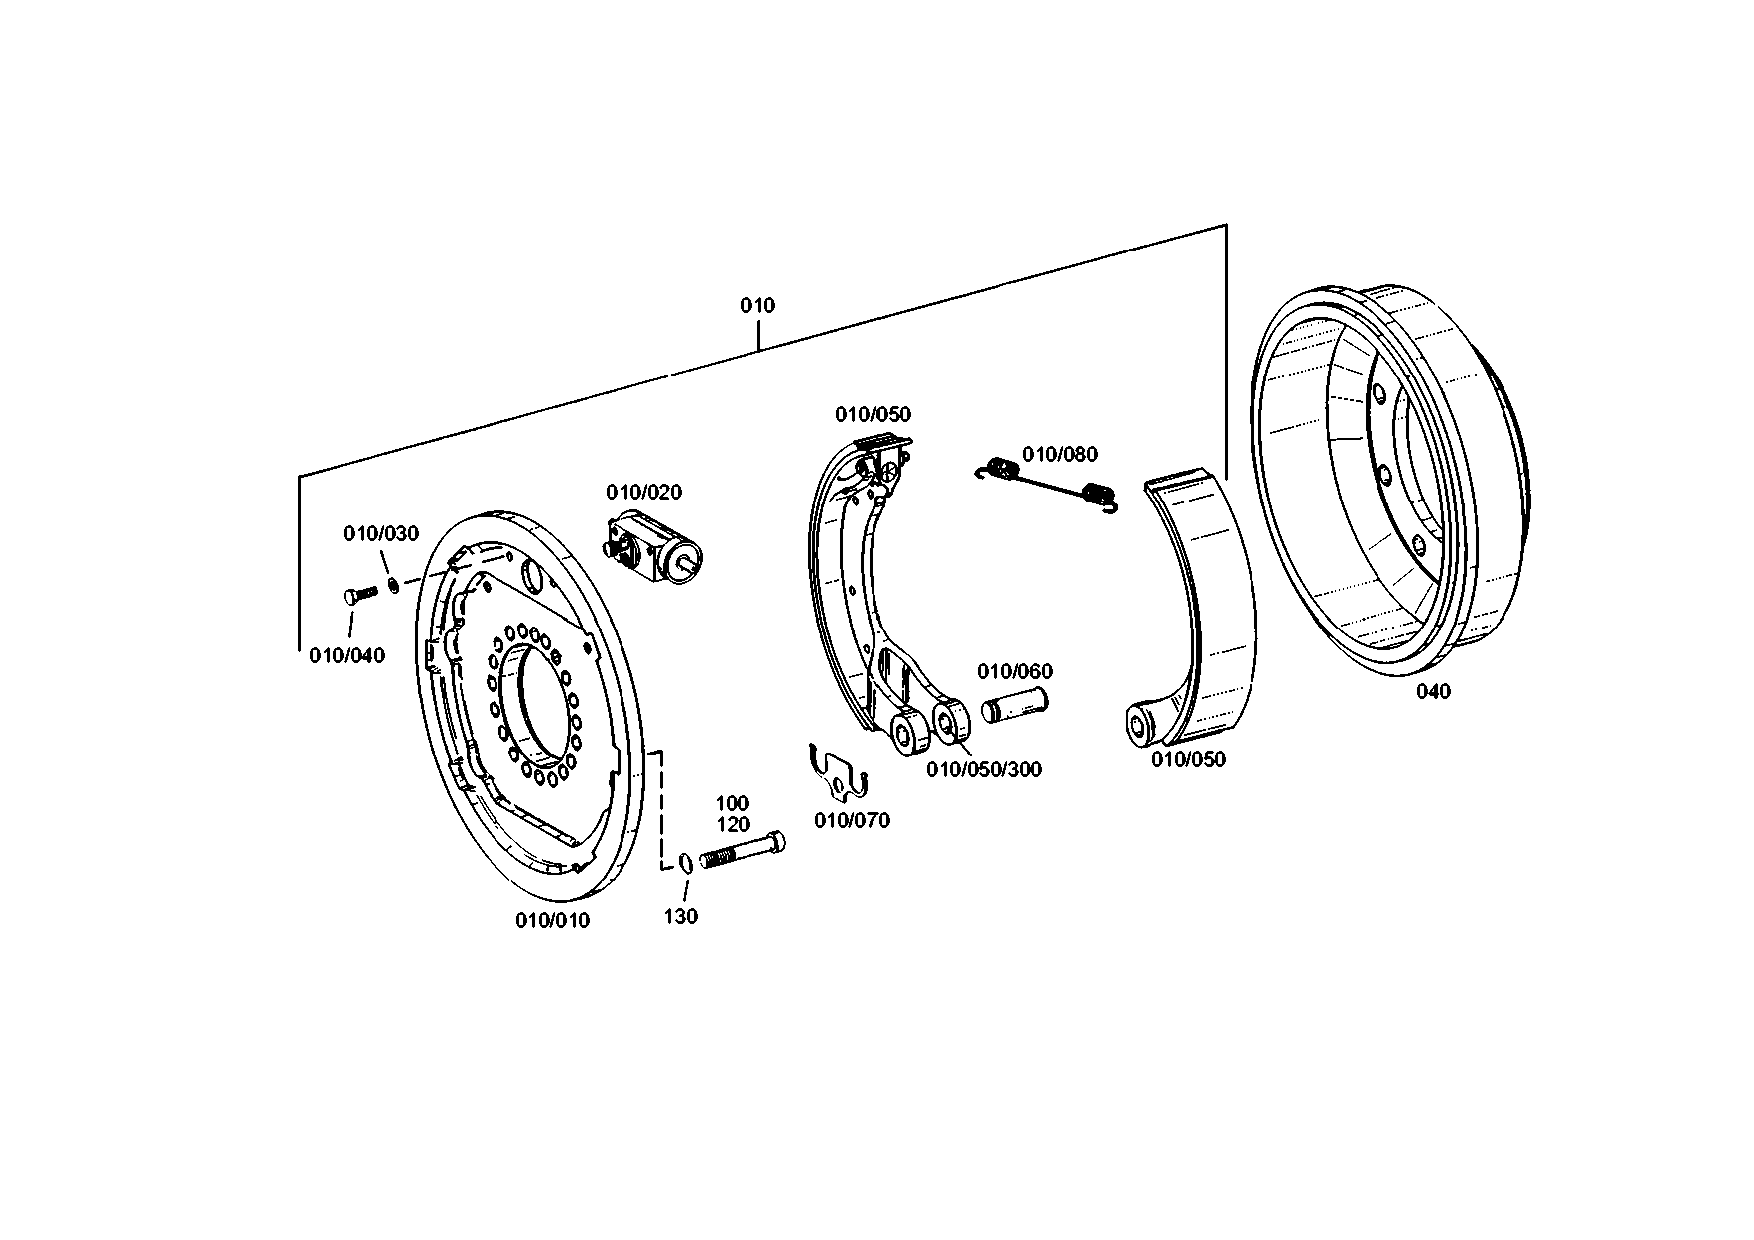 Zf Brake Diagram | Electrical Engineering Wiring Diagram